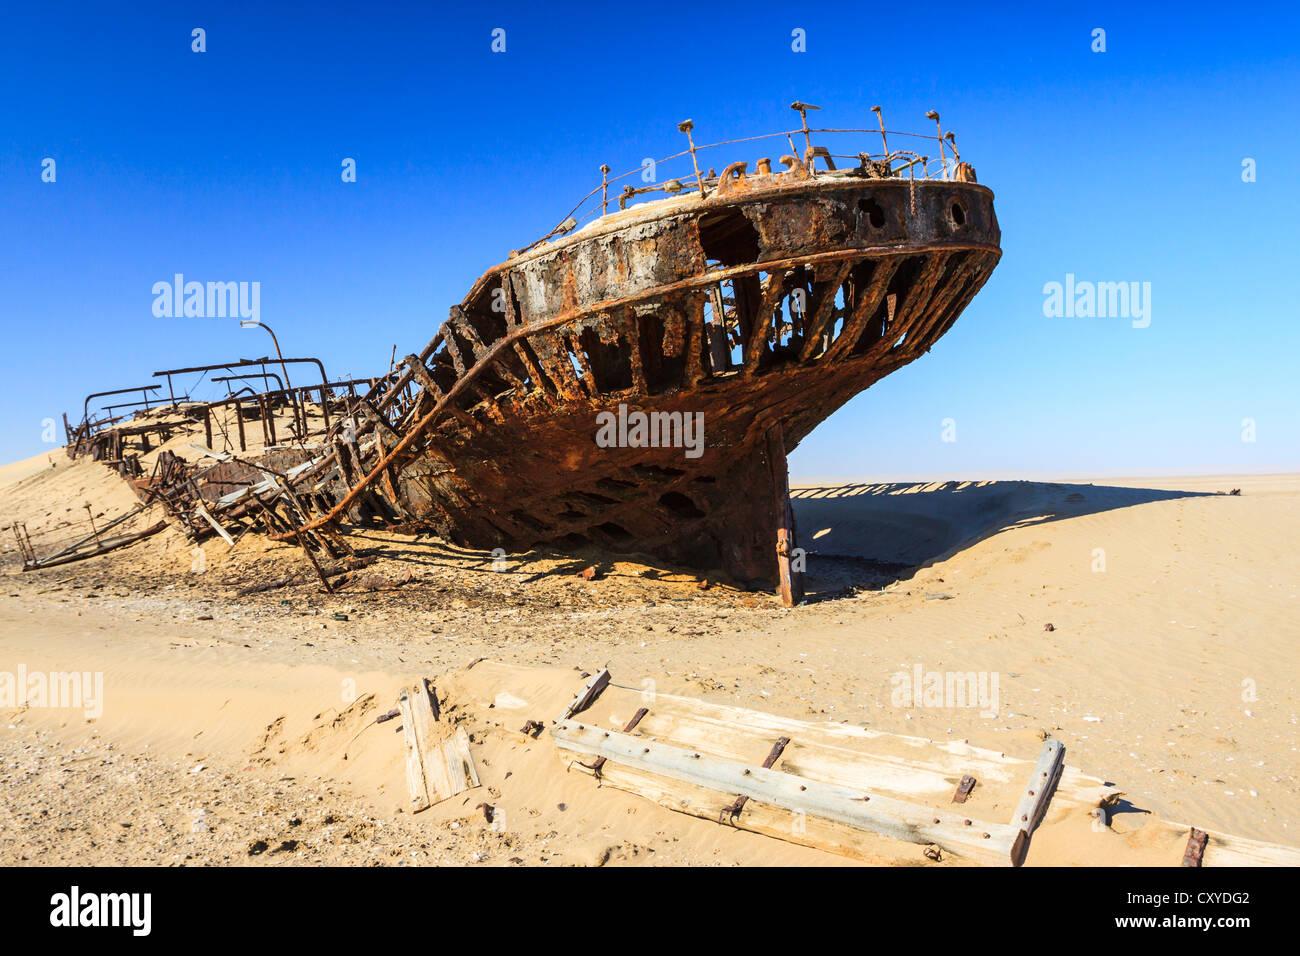 Eduard Bohlen Naufrage, Désert du Namib, le Namib Naukluft Park, Namibie, Afrique Photo Stock